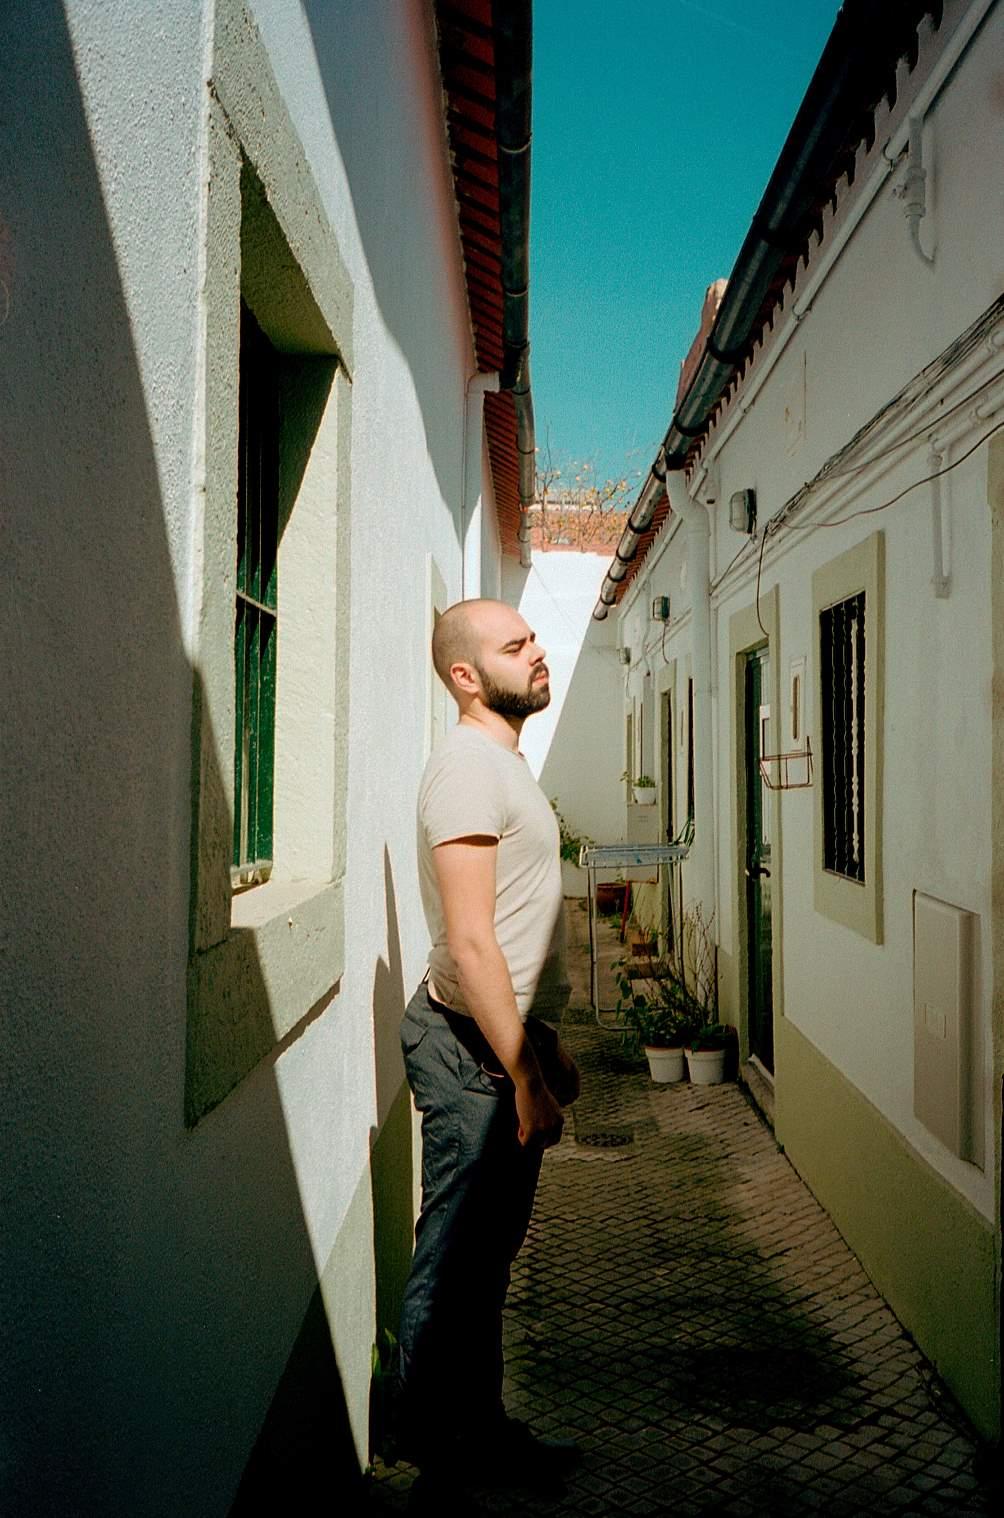 Nicolas from Lisbon